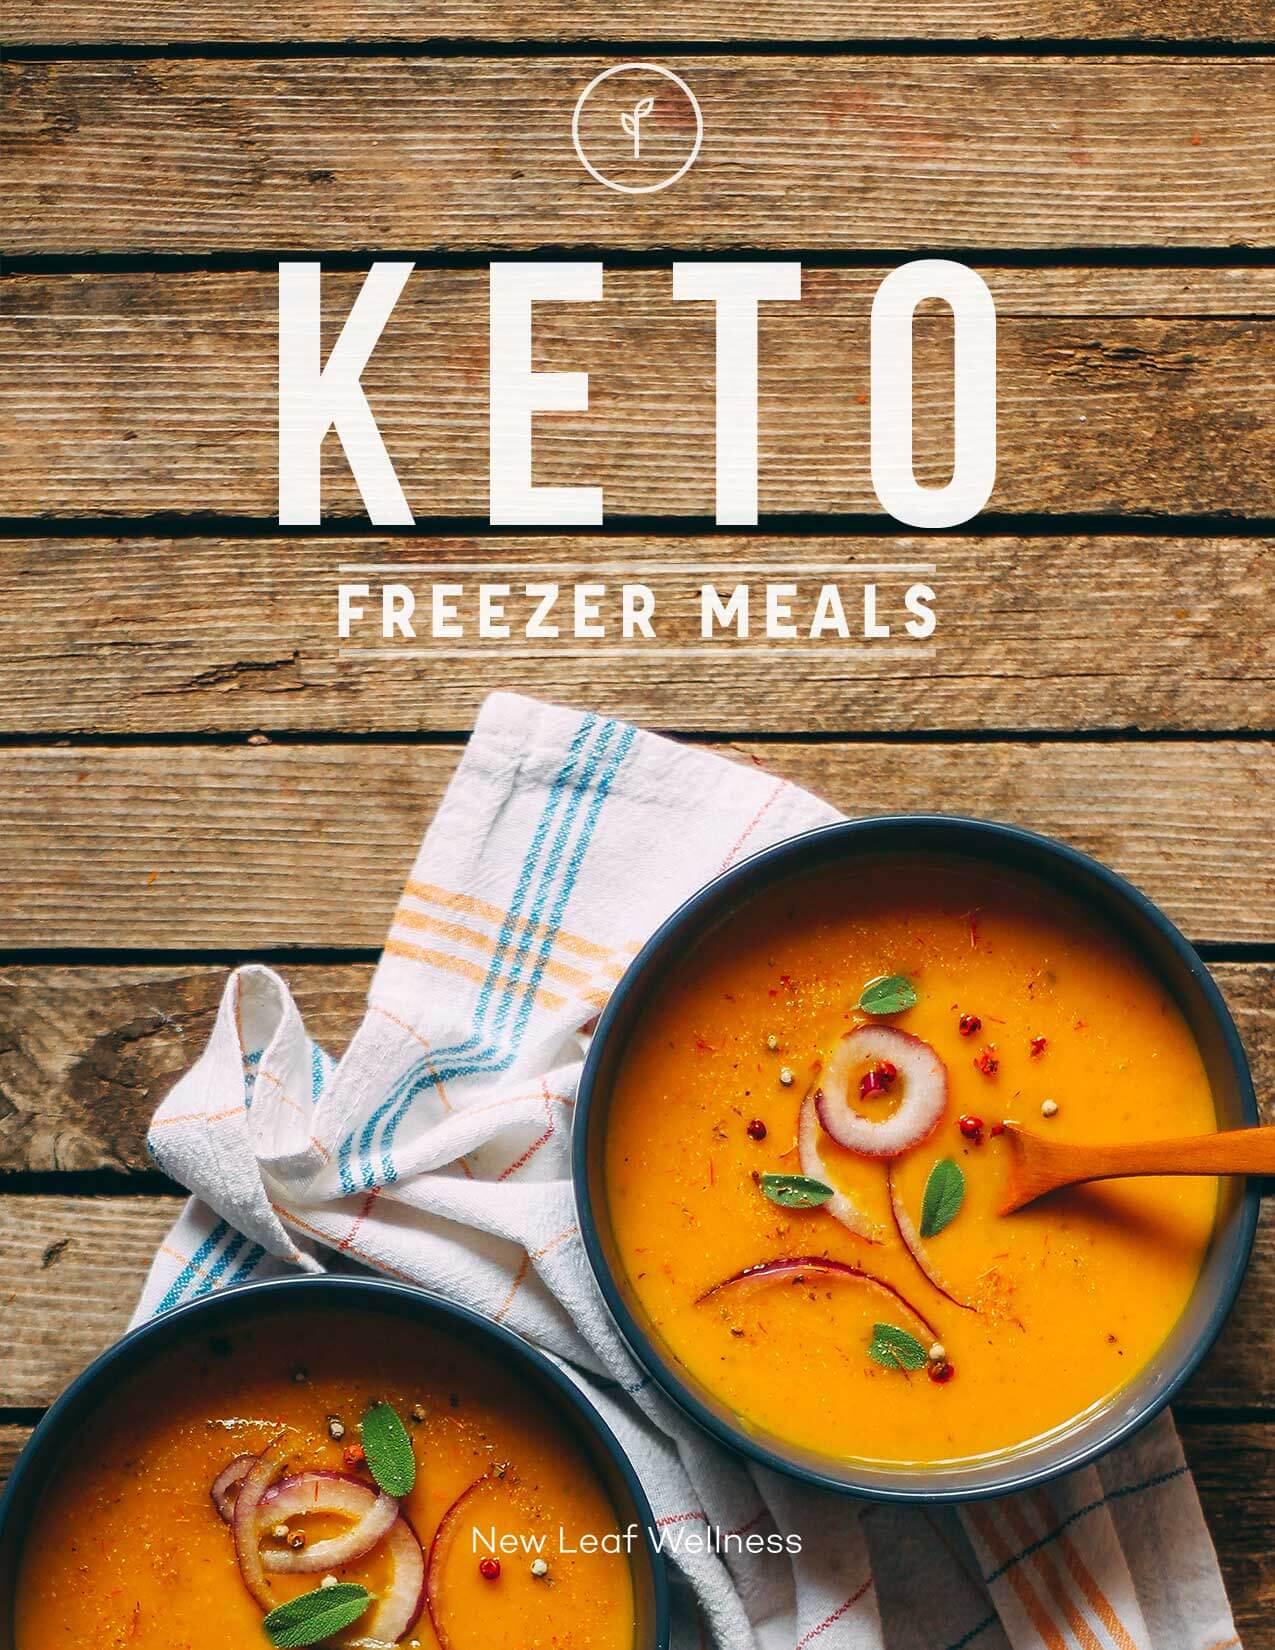 Keto freezer meals cookbook new leaf wellness keto freezer meals cookbook forumfinder Choice Image